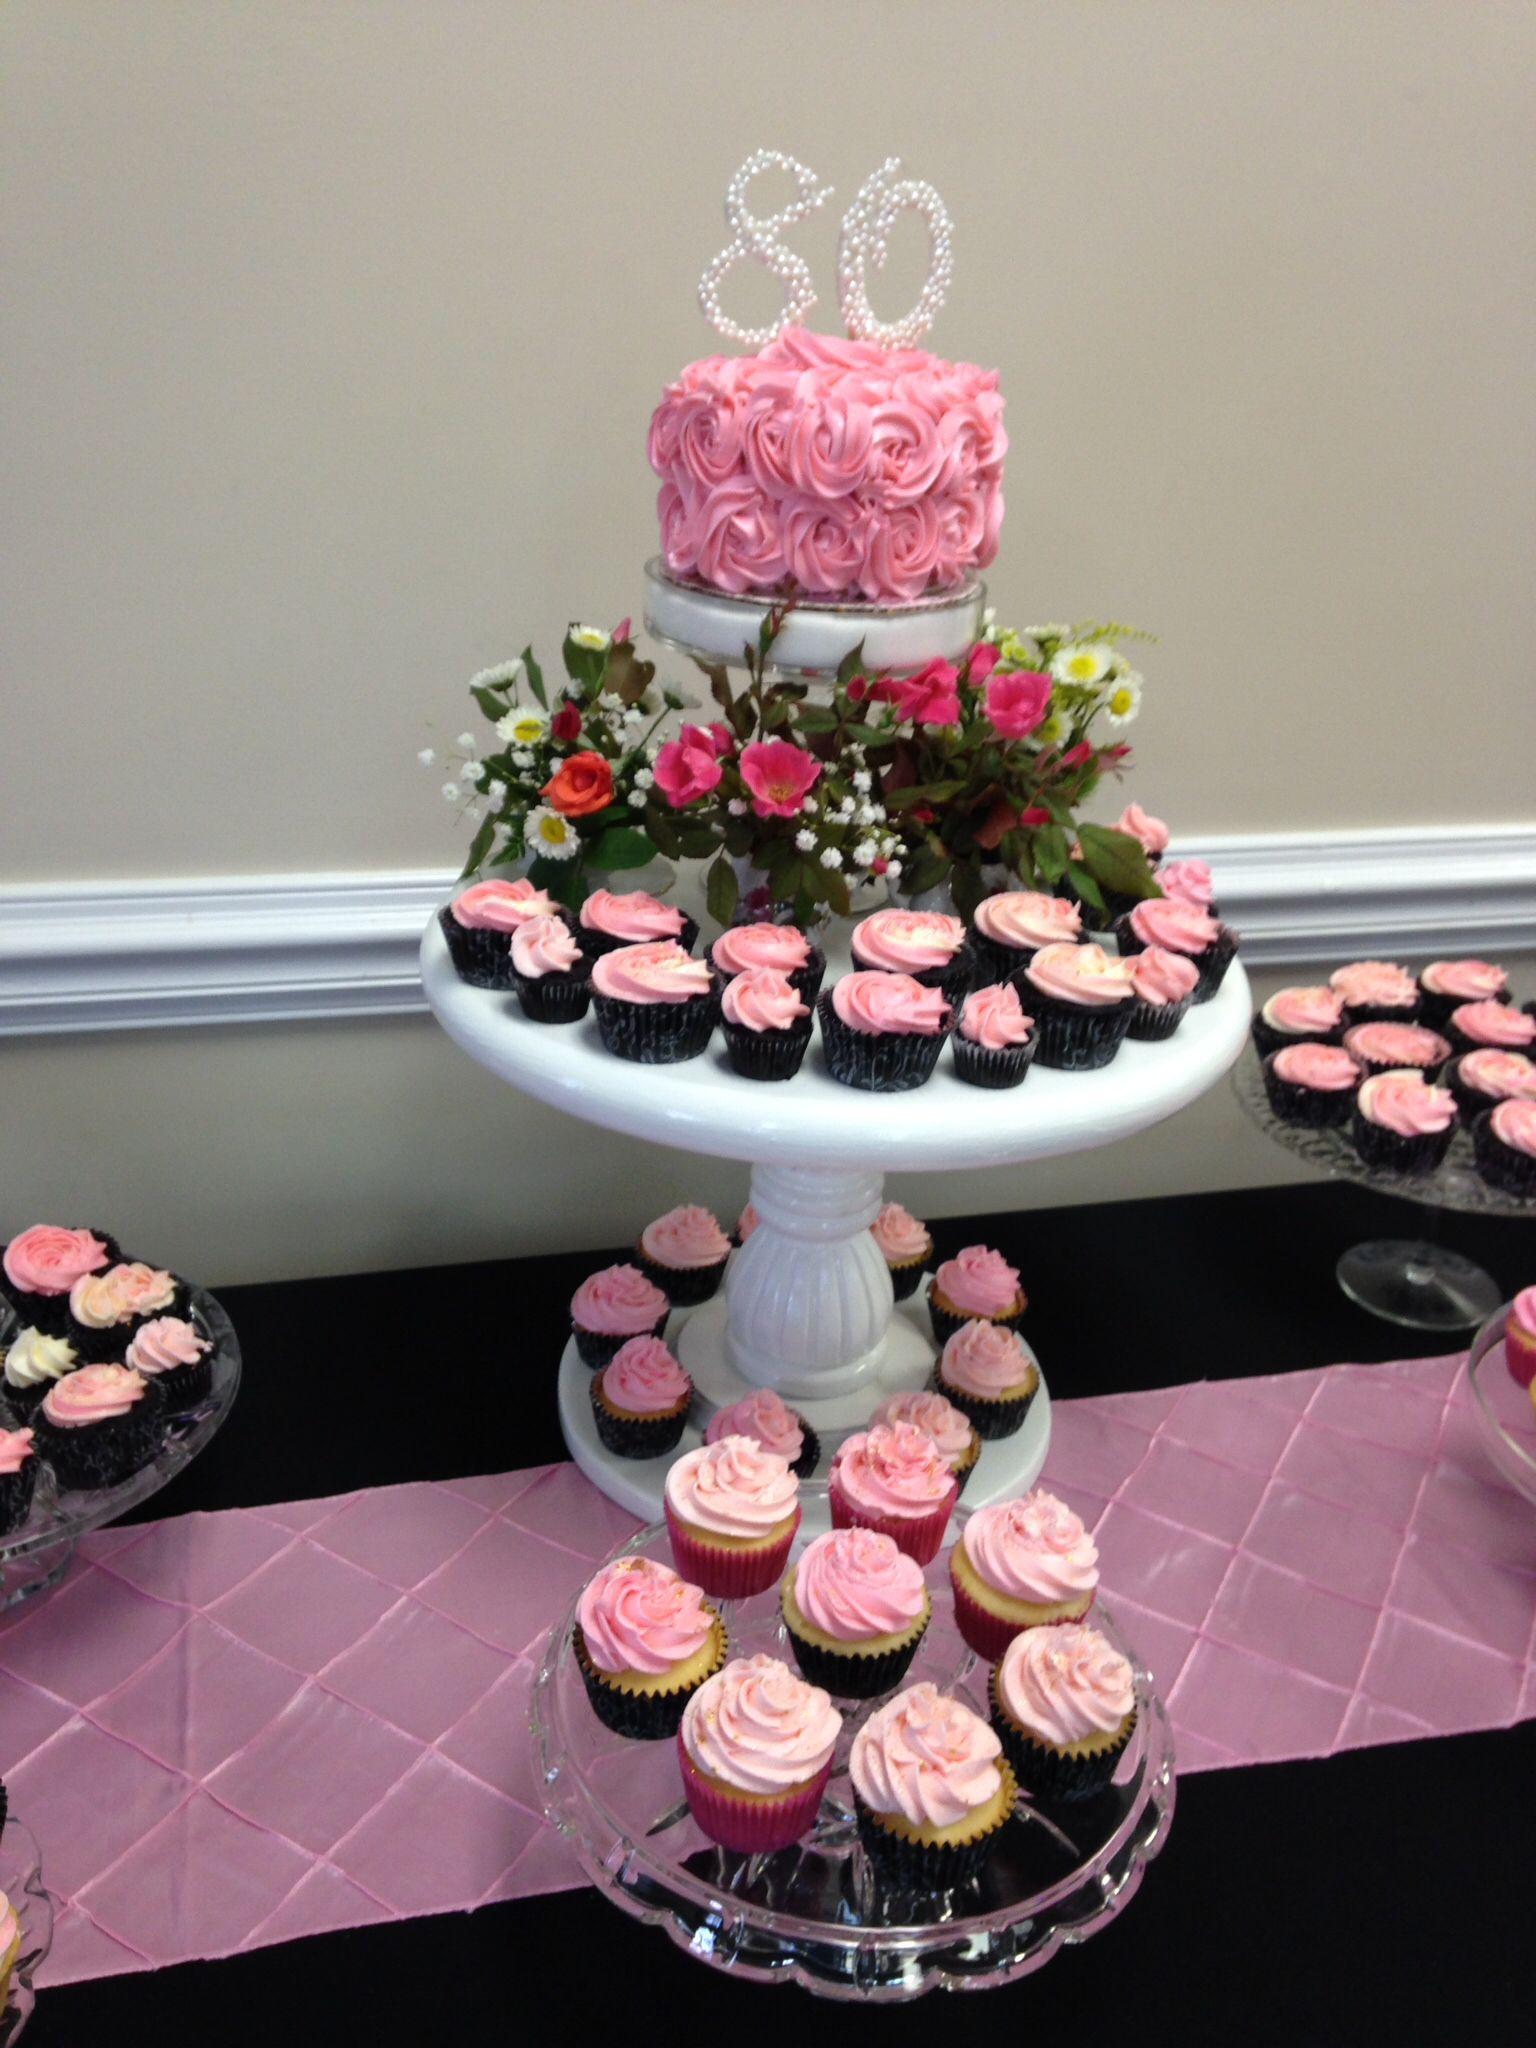 Cupcakes For An Th Birthday Party Parties Cake Celebration Also Cathi Burton Burtoncathi